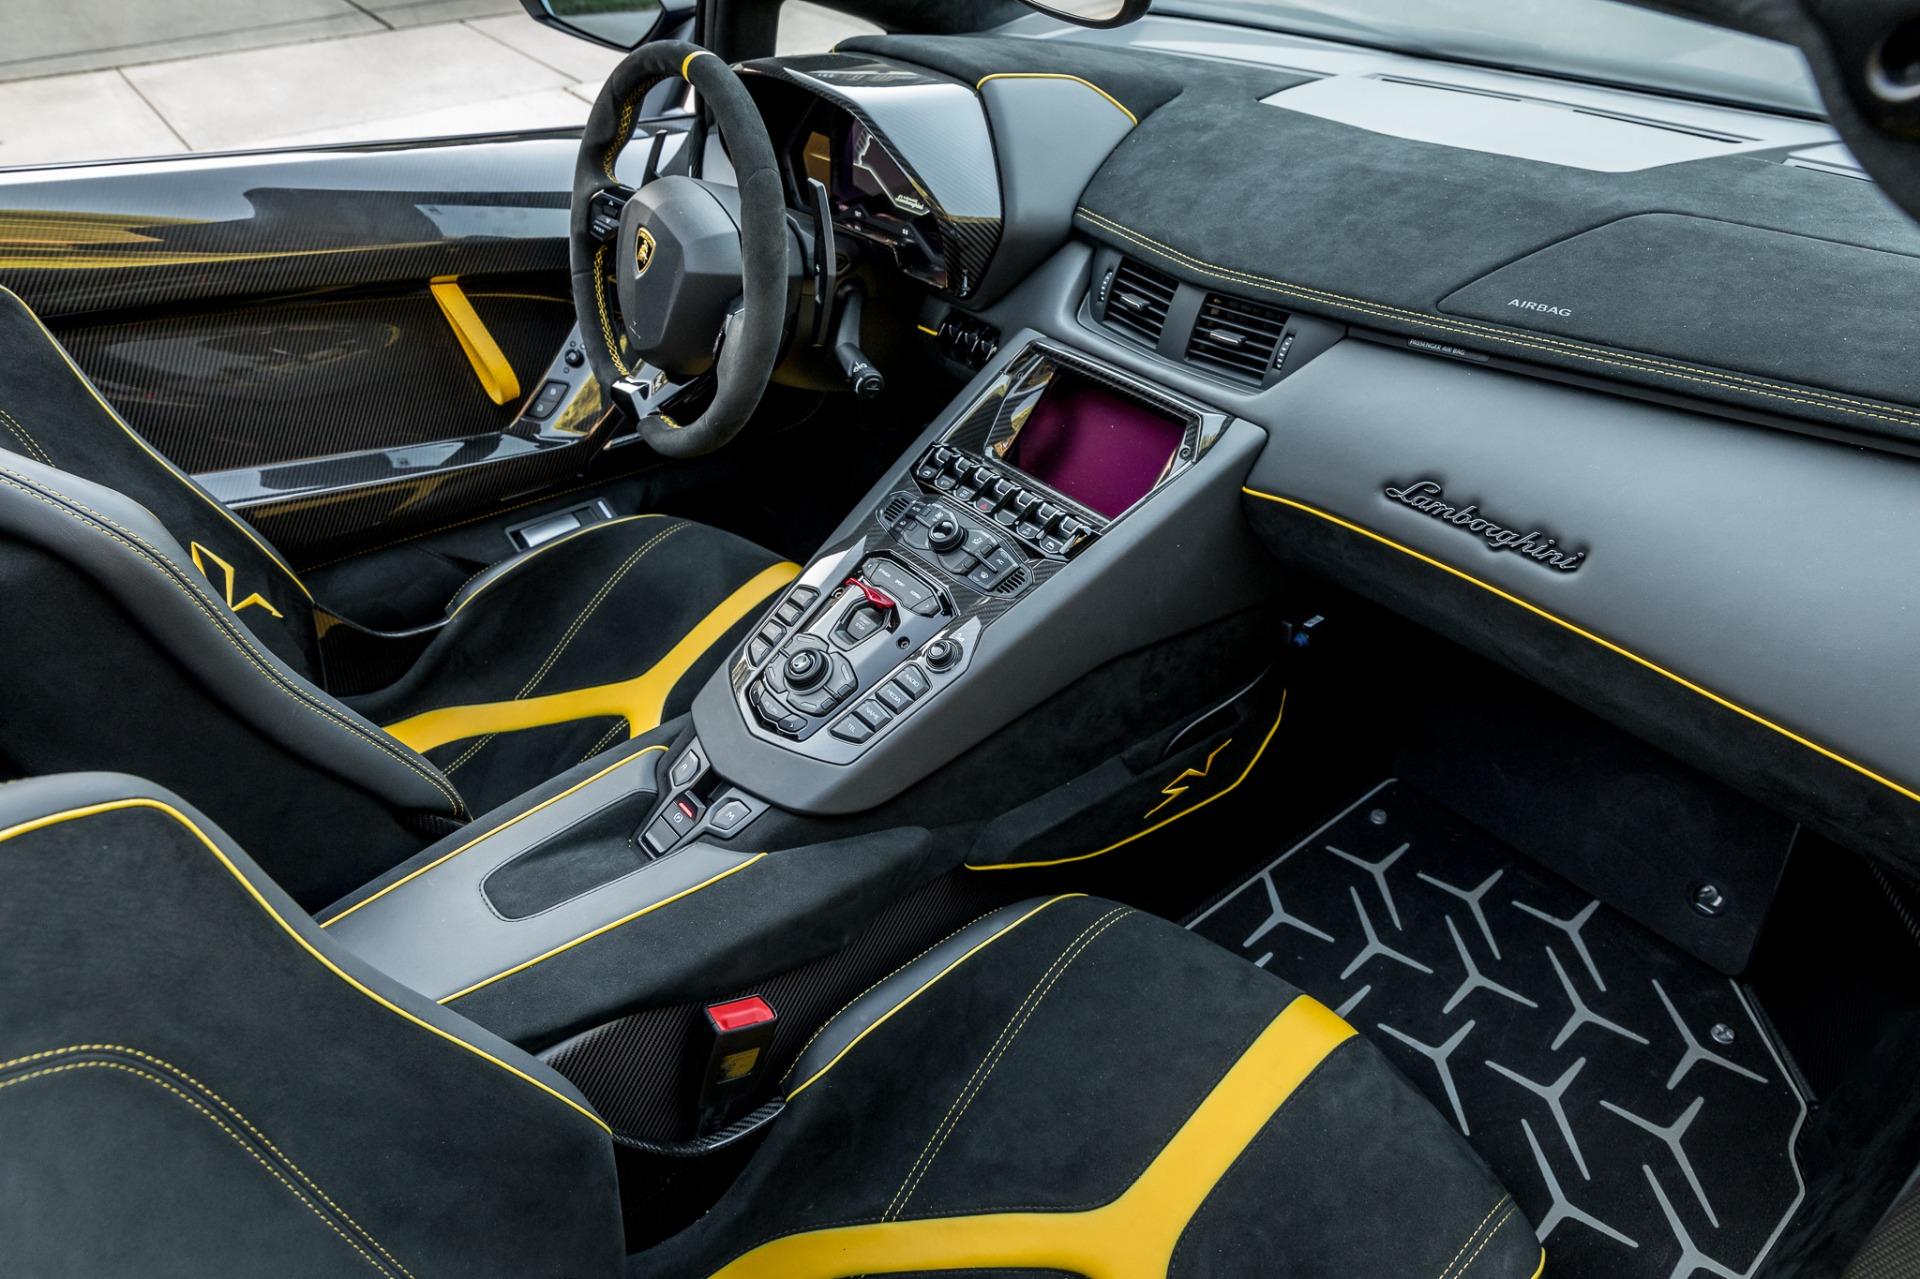 Used 2017 Lamborghini Aventador LP 750-4 SV / 740HP / AWD / 1930 MI / NAV / CAMERA for sale Sold at Formula Imports in Charlotte NC 28227 14